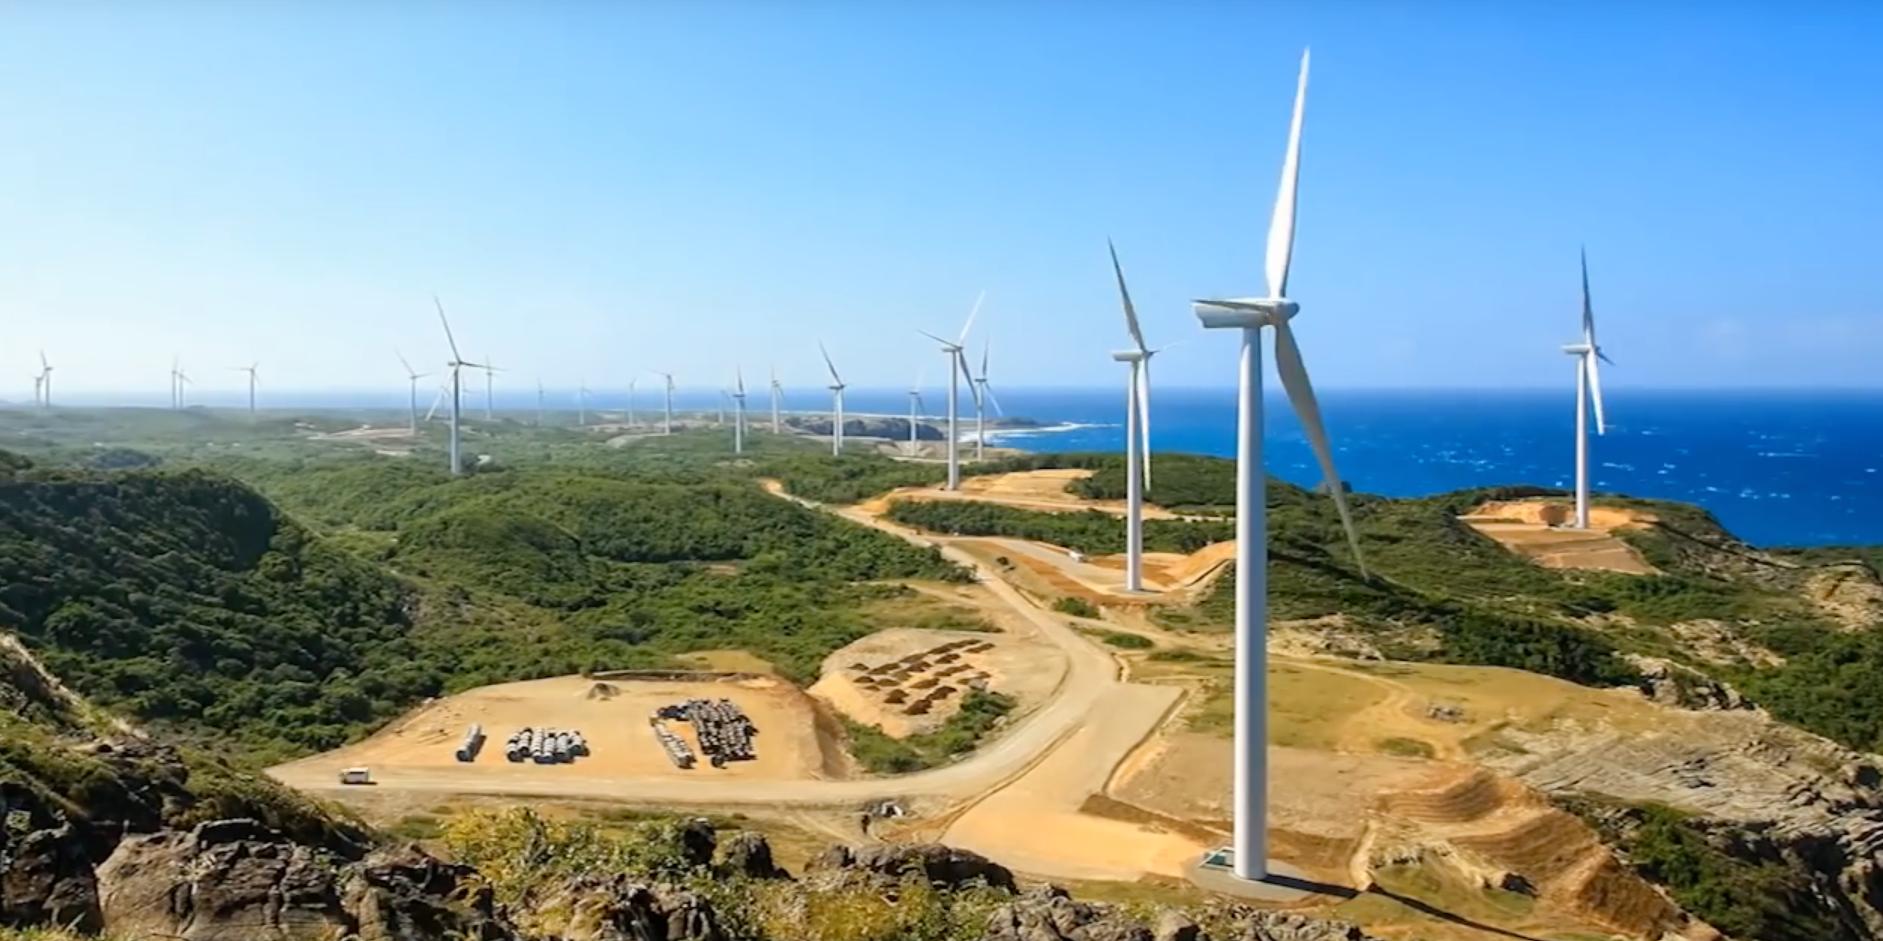 Even Climate Change Deniers Want To Pursue Renewable Energy